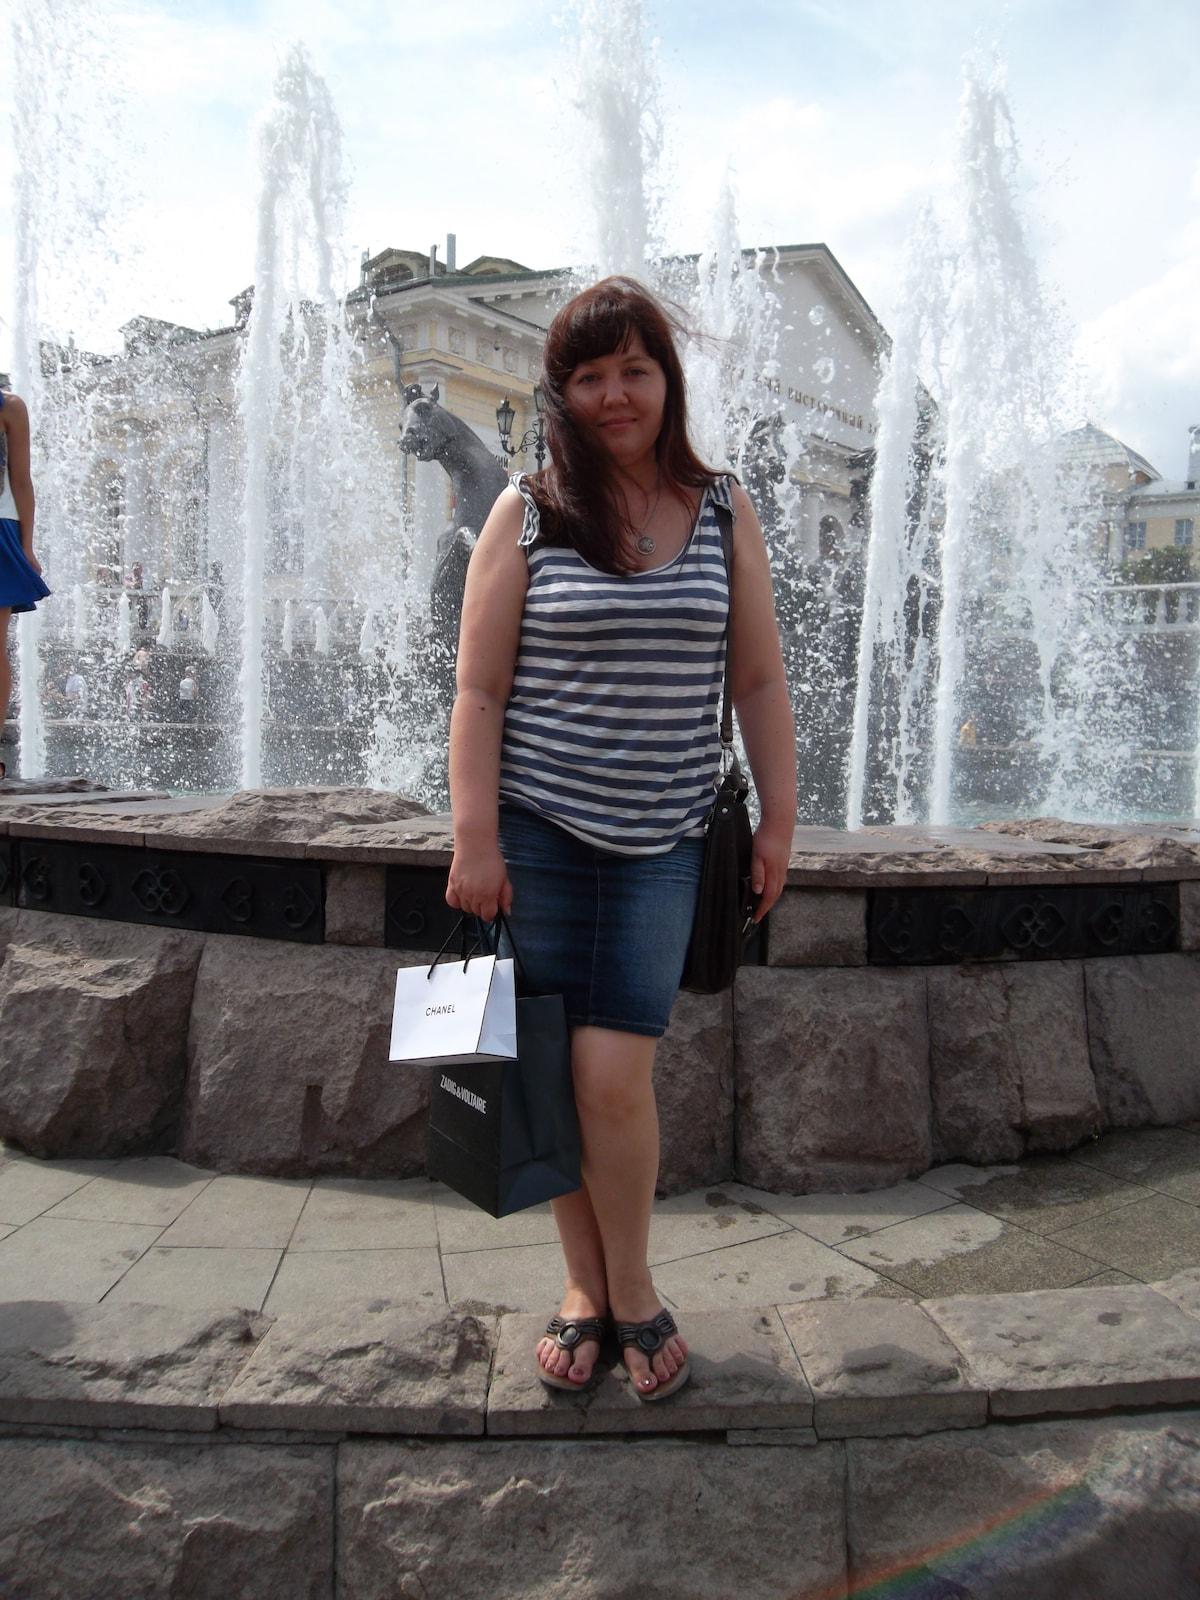 Лариса from Барнаул